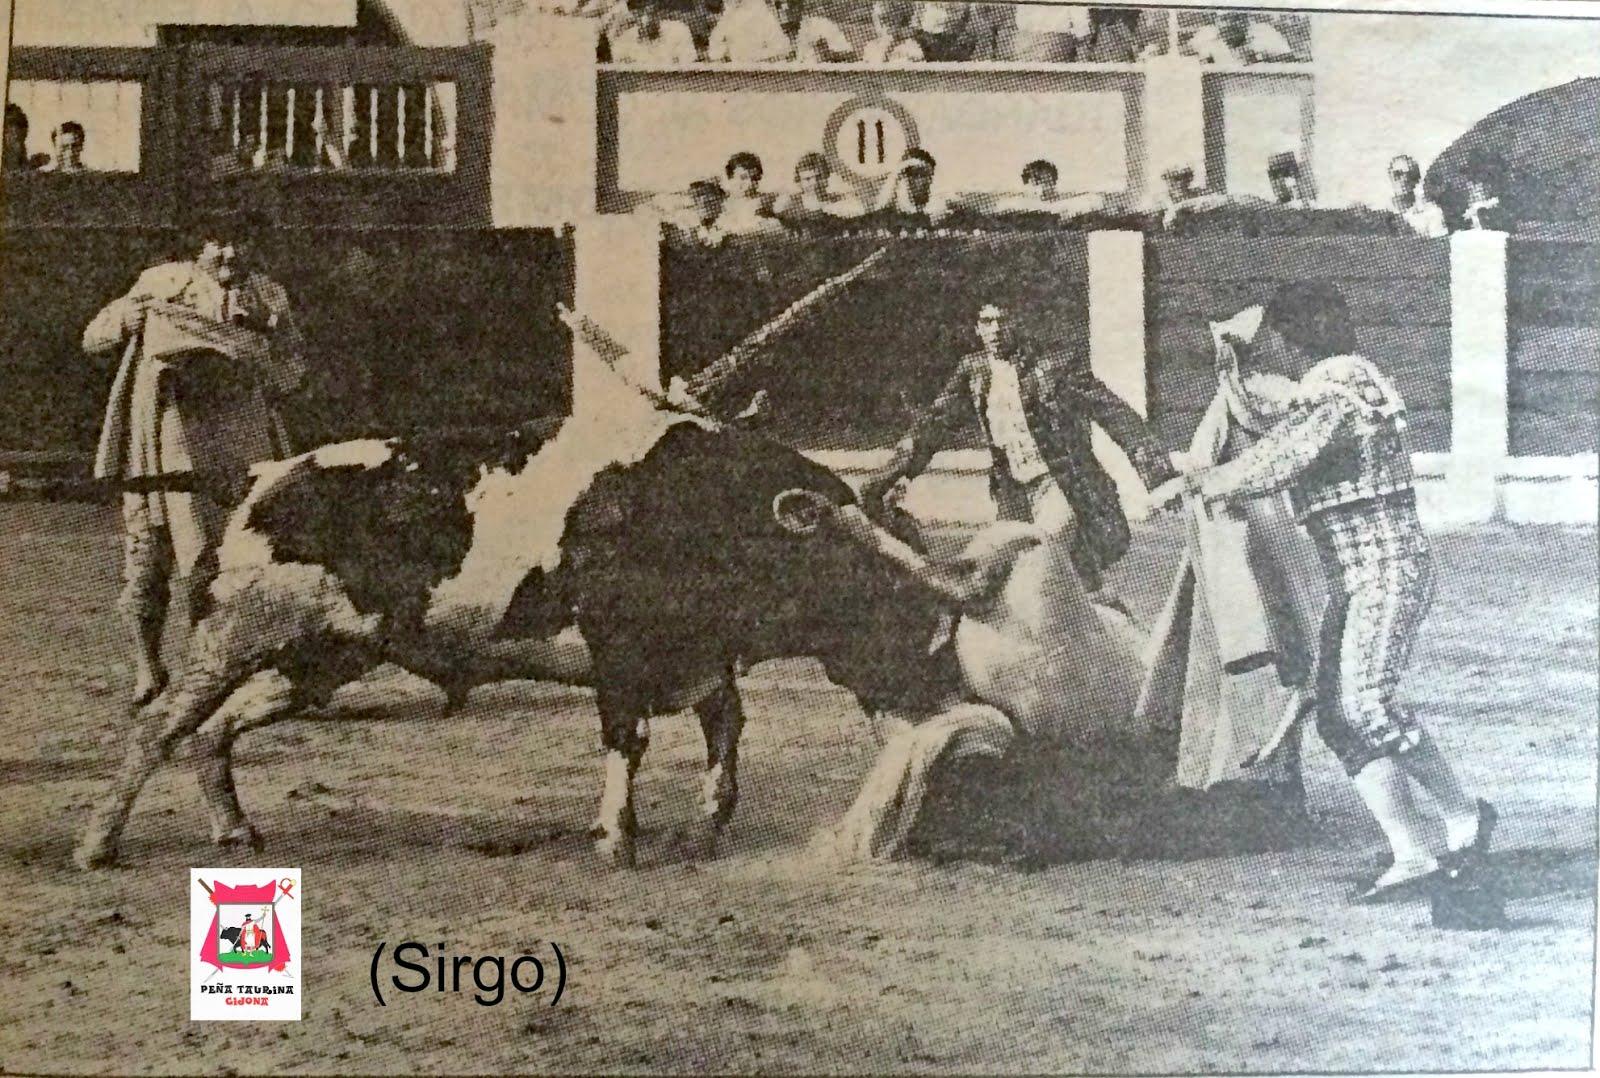 GIJON 1983 SIRGO